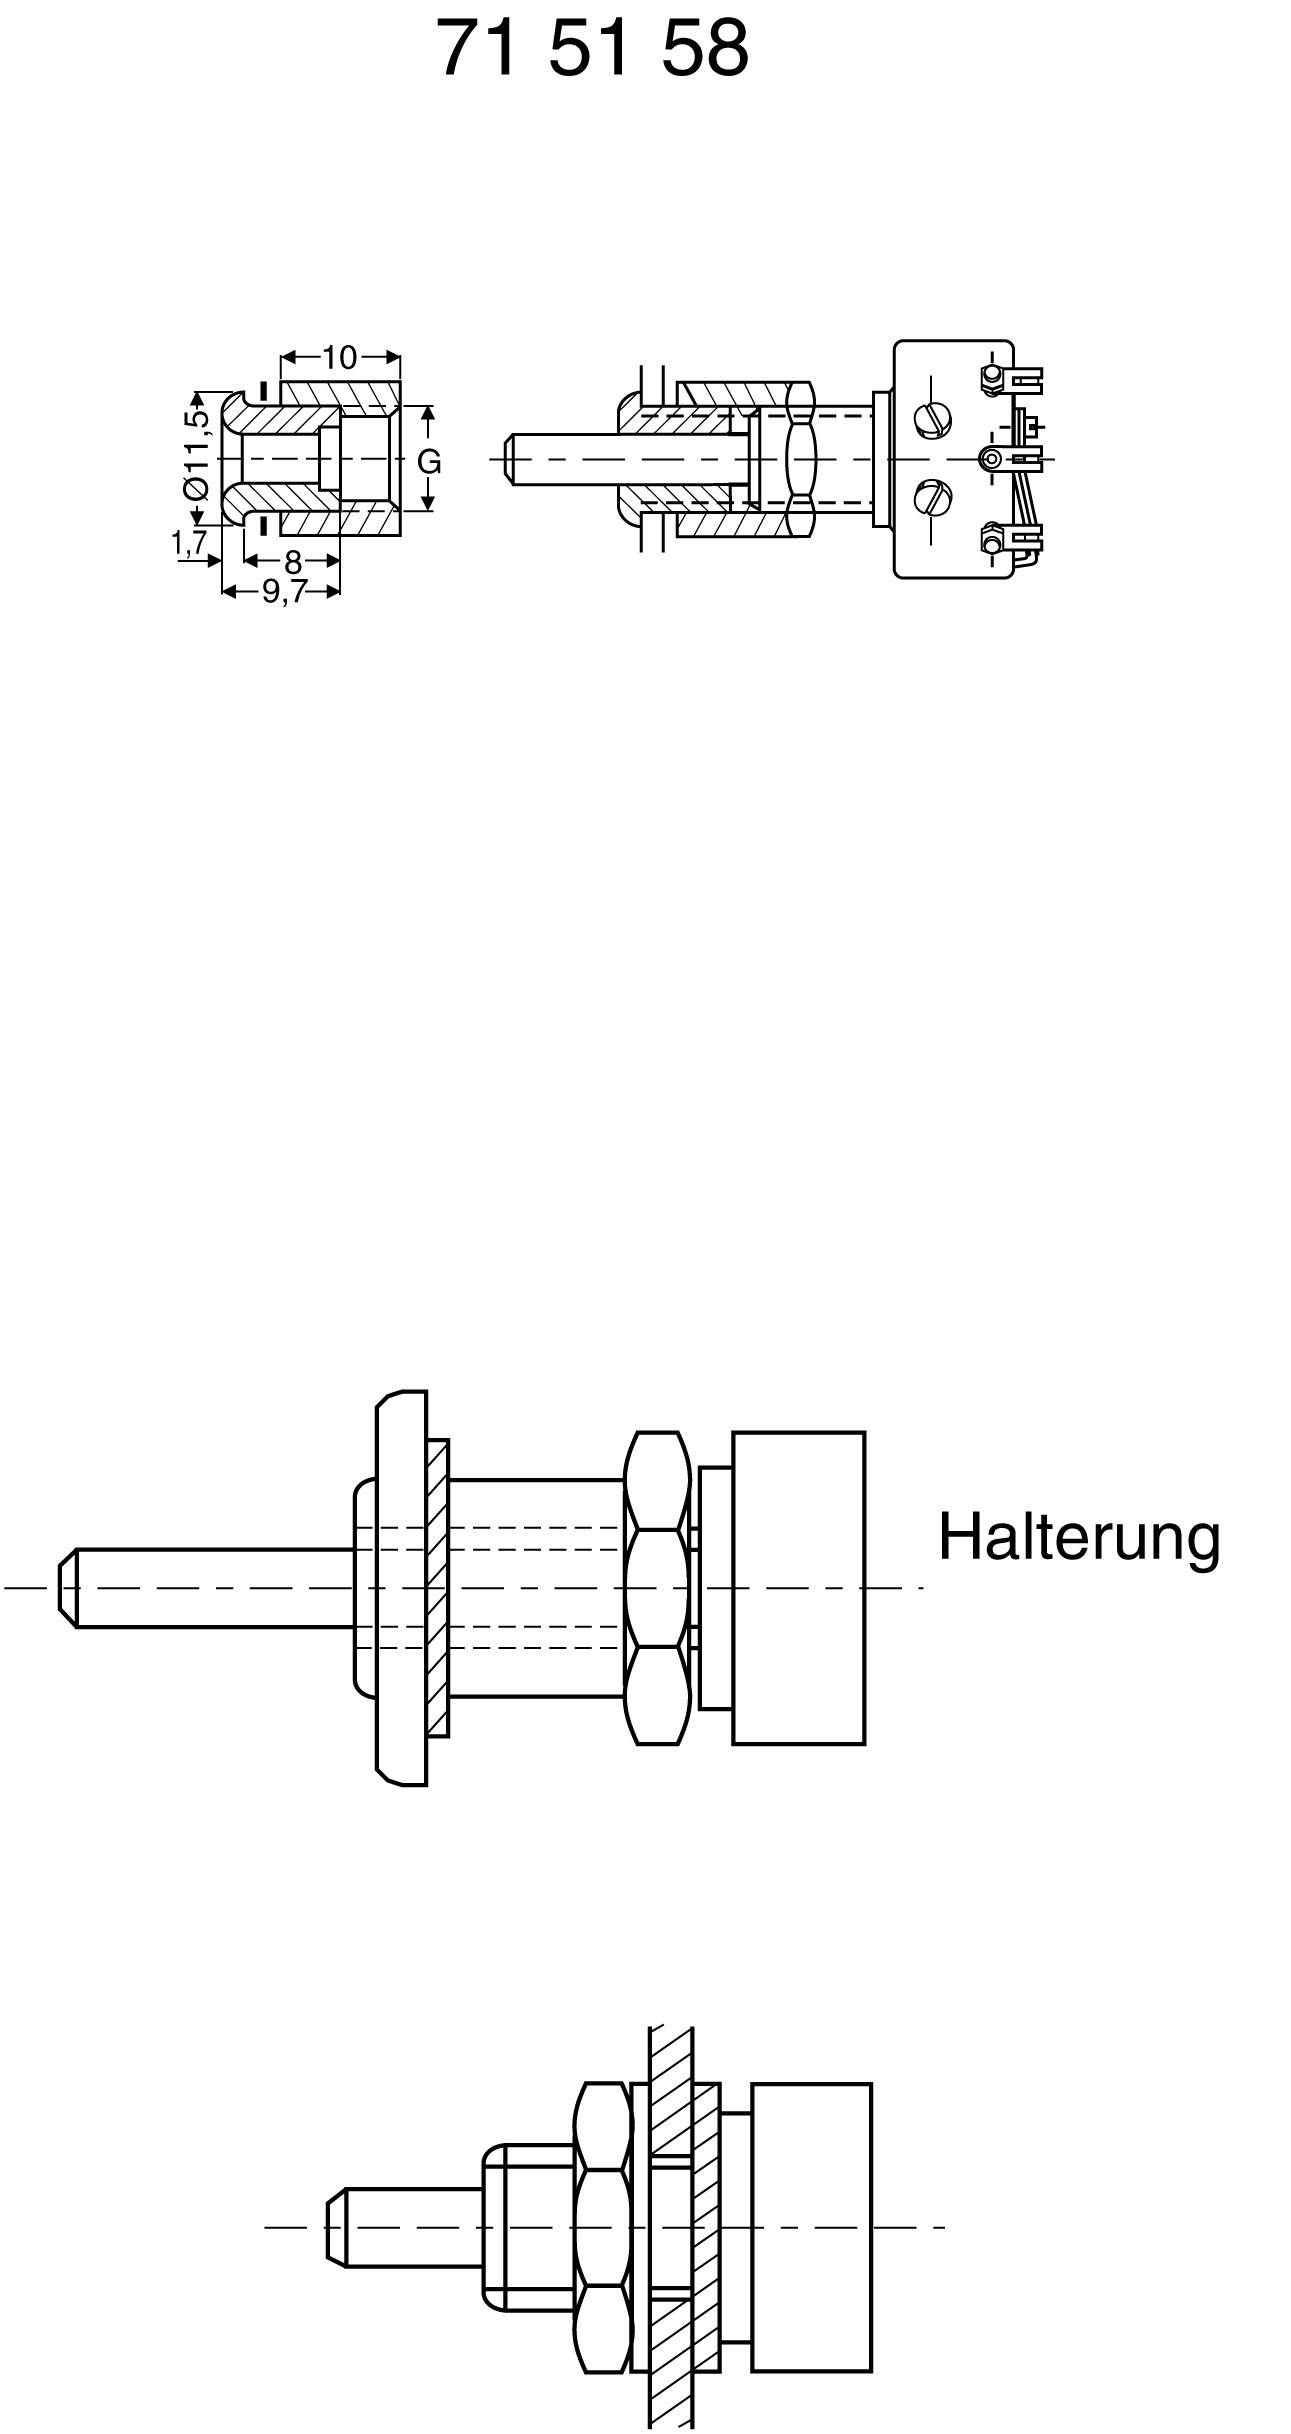 Úchytka pro potenciometr M 10x0.75